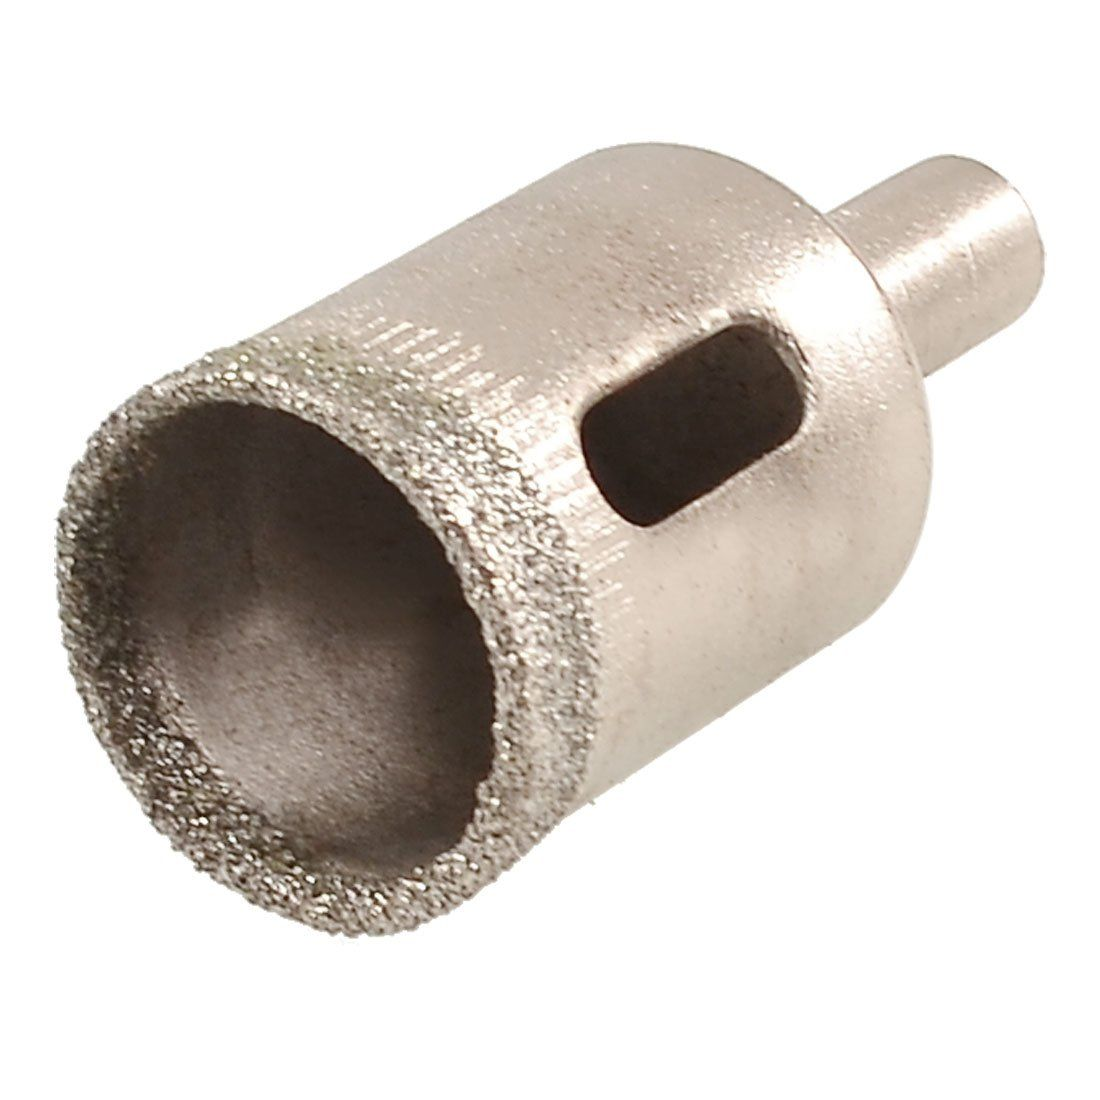 20mm Diamond Tipped Drill Bit Ceramic Tile Glass Hole Saw Affiliate